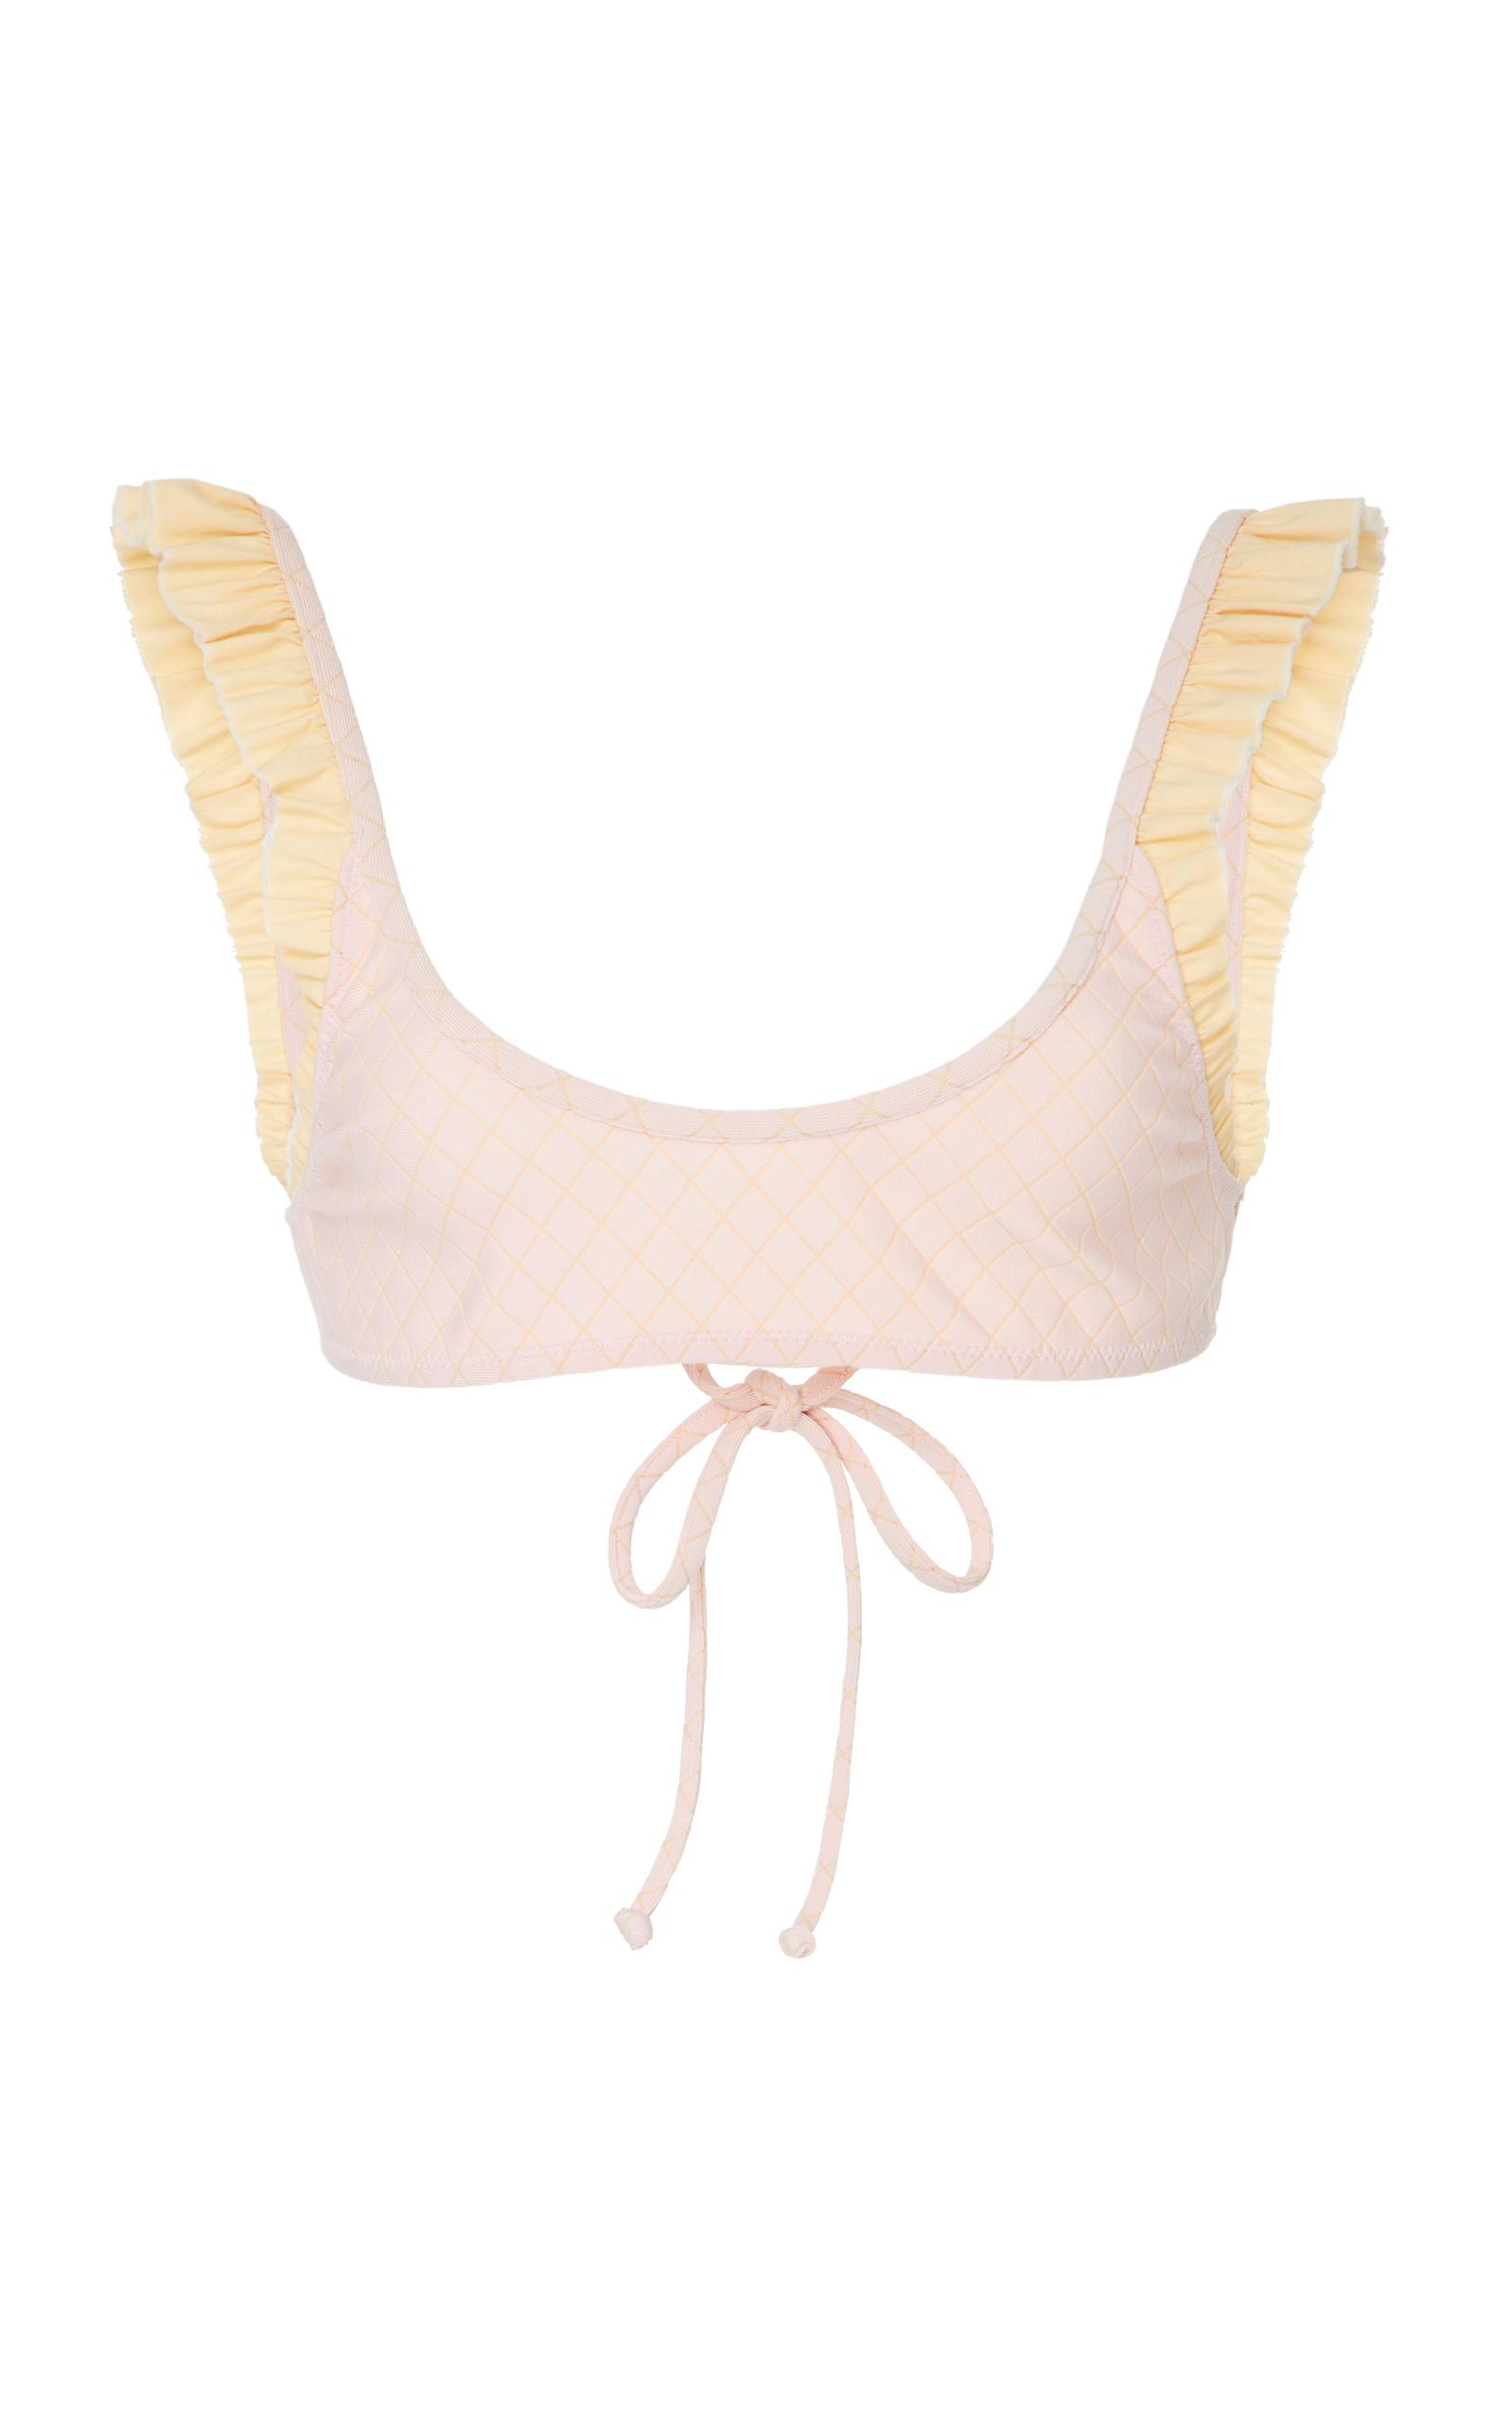 Petal 2 Jacquard Diamond Bikini Top Made By Dawn Clearance View pzVfgW